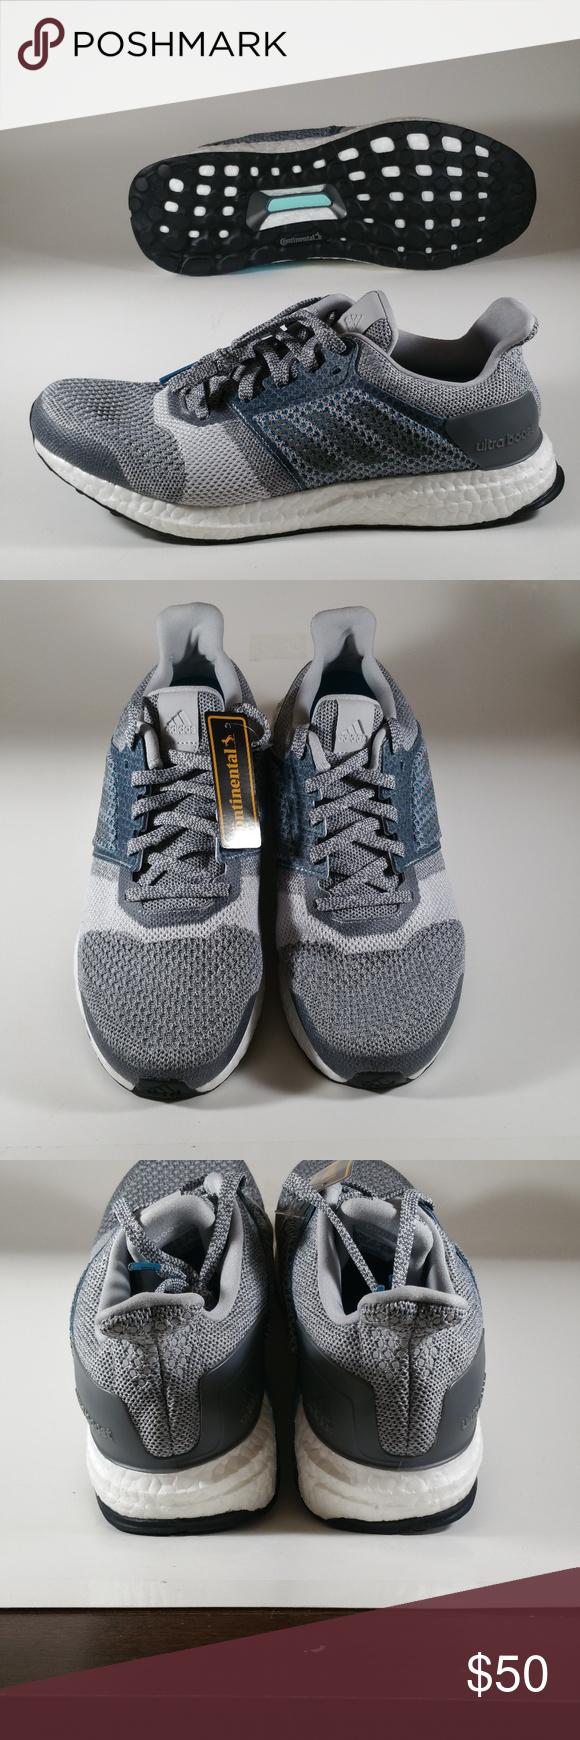 b53f6d674a577 Women adidas Ultraboost ST Grey Running Shoes If you have an offer ...